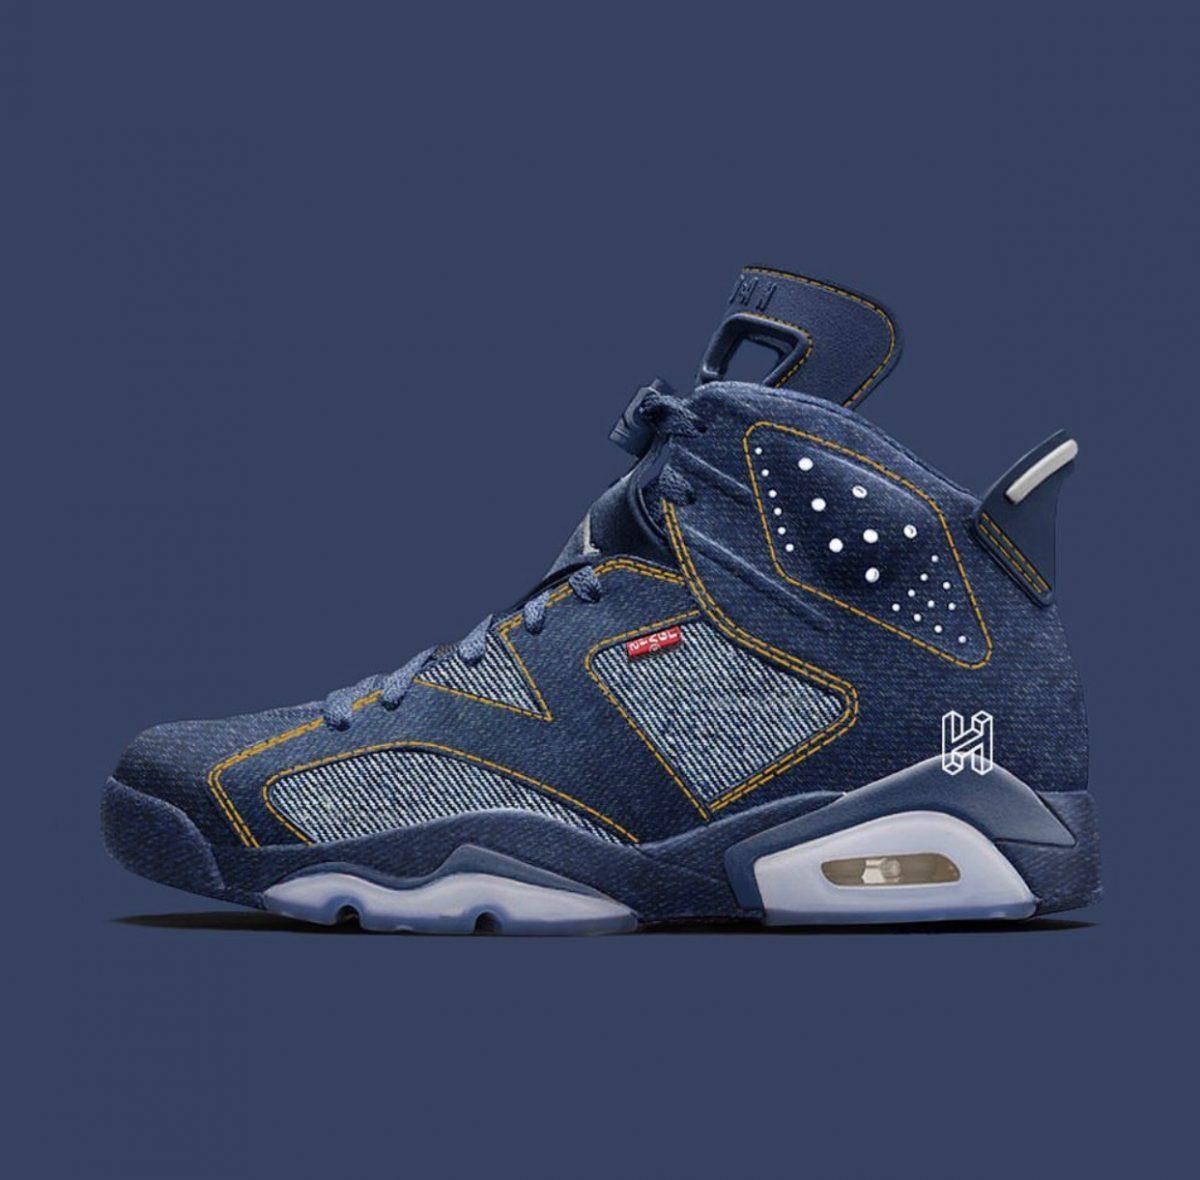 Levi's & Jordan Brand Linking Up Next On The Air Jordan 6